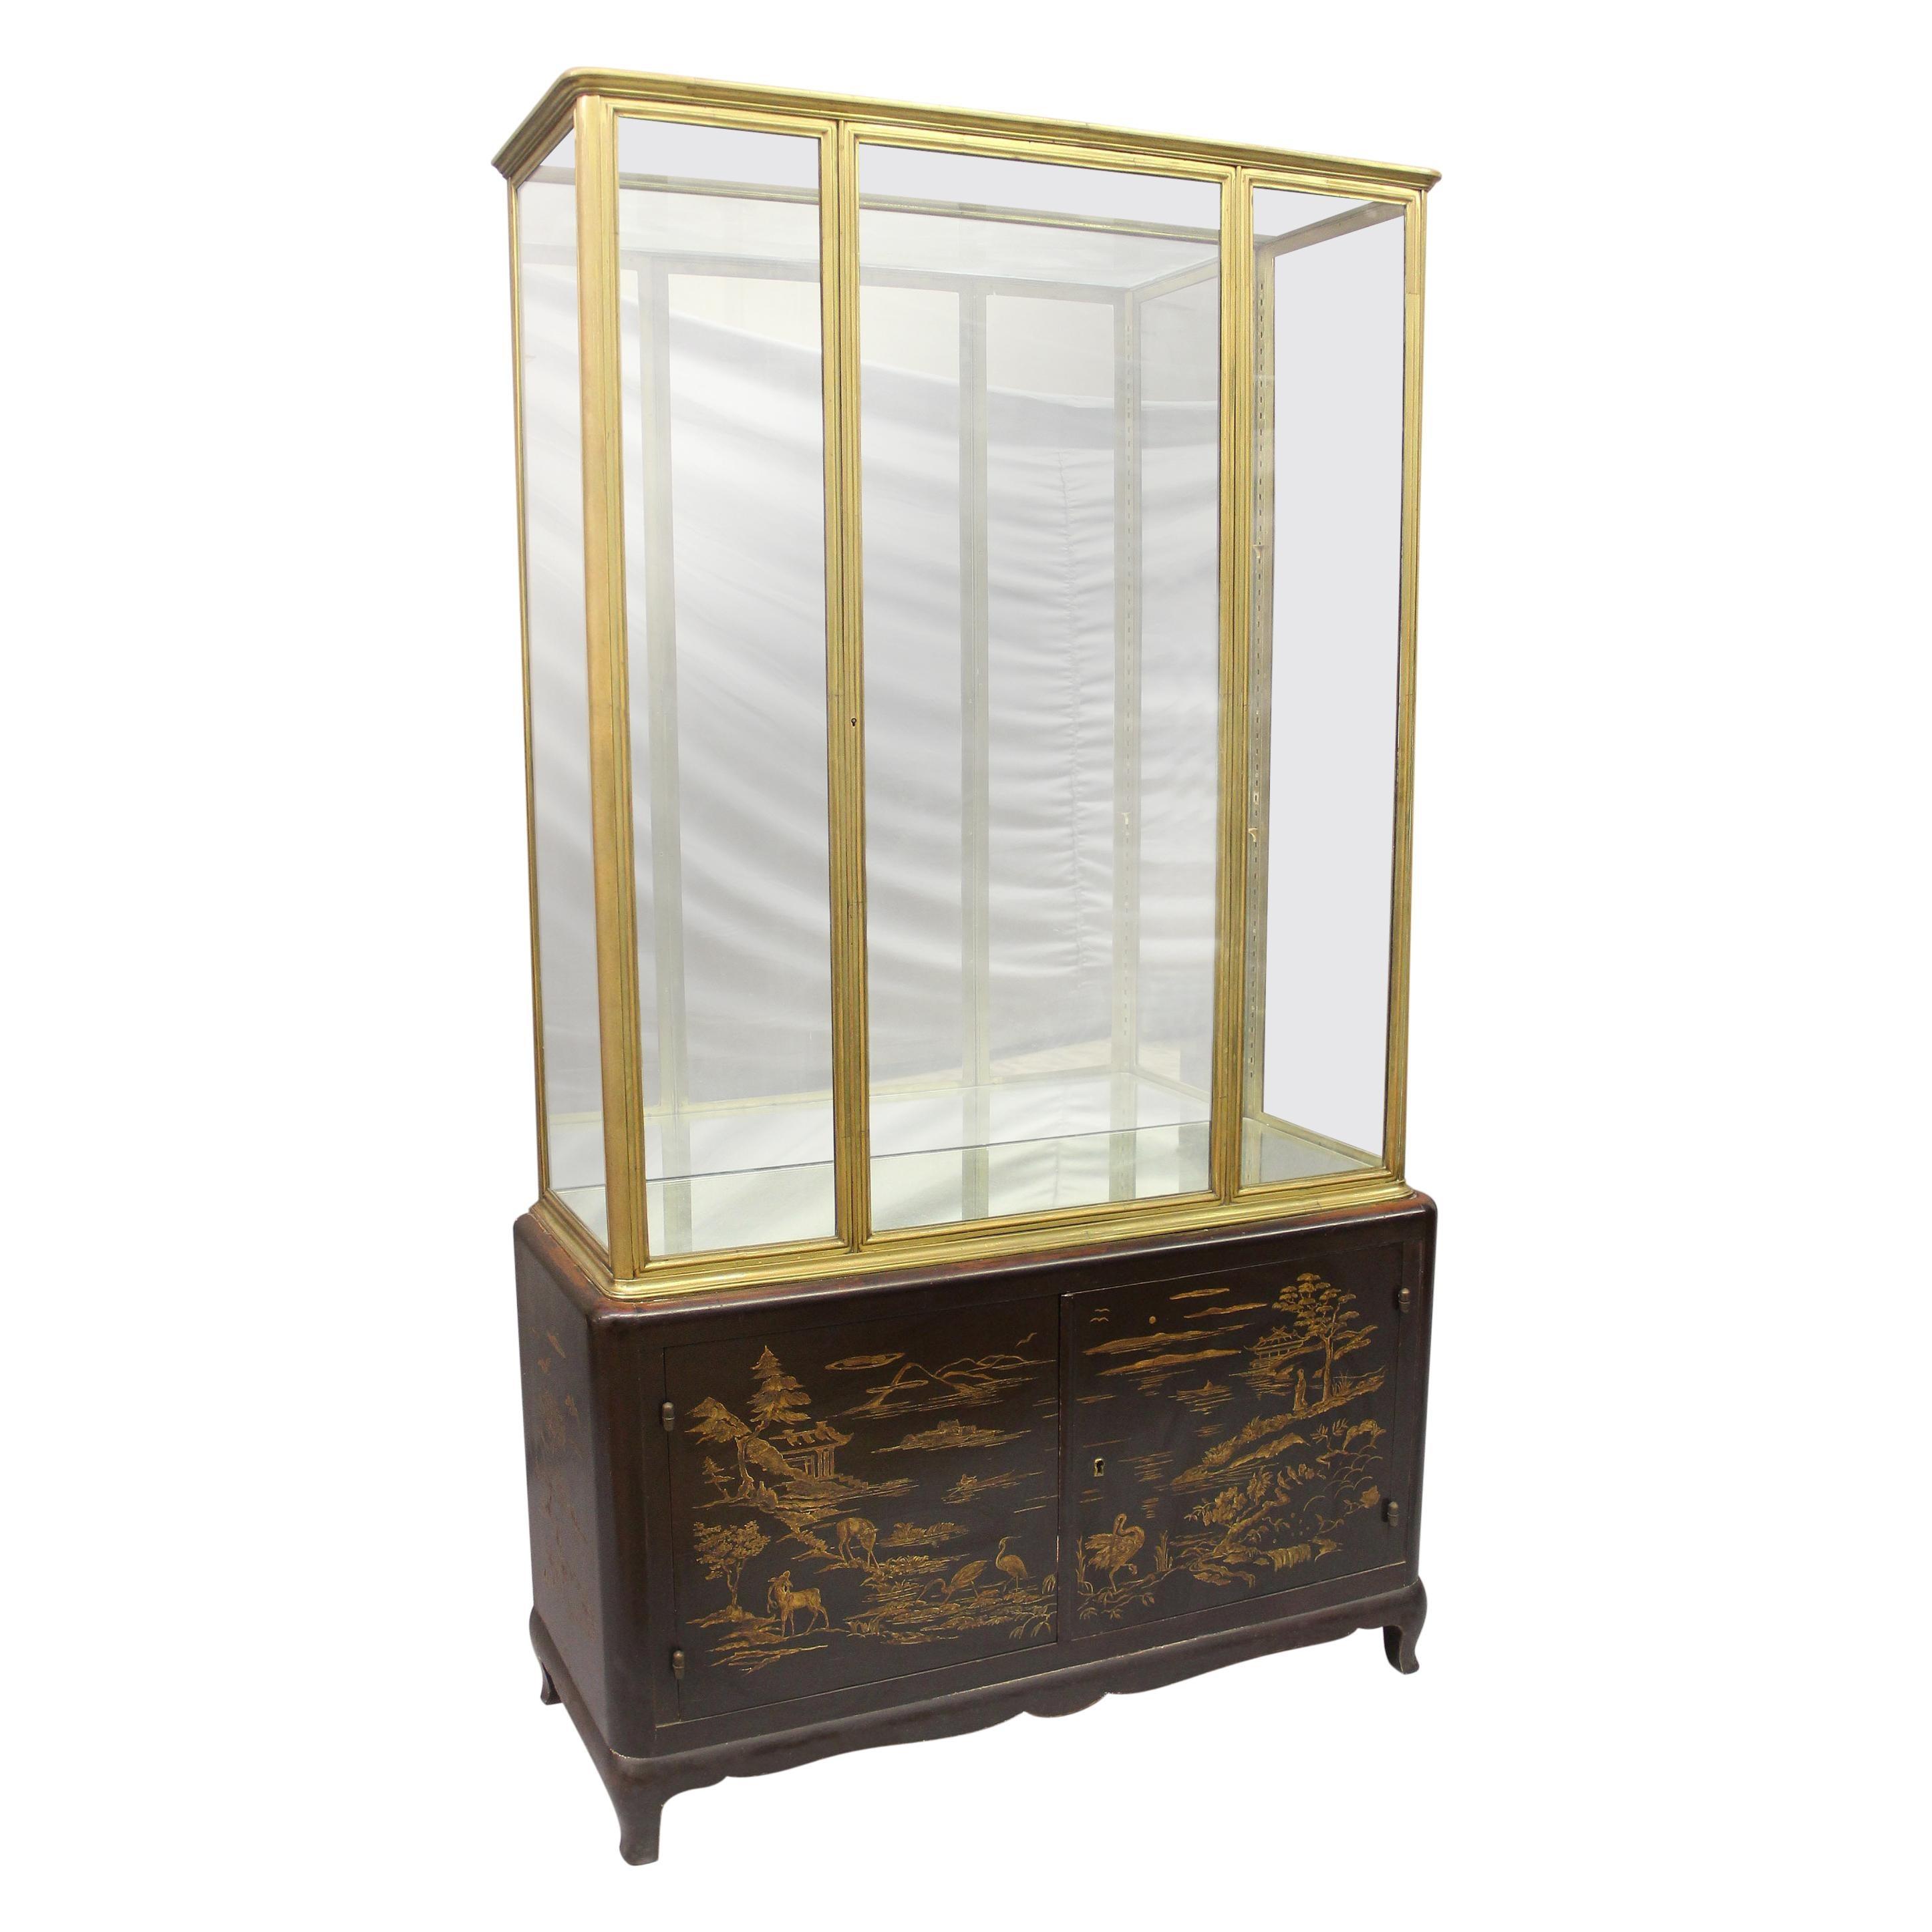 Interesting Late 19th Century Gilt Bronze and Lacquer Vitrine Cabinet